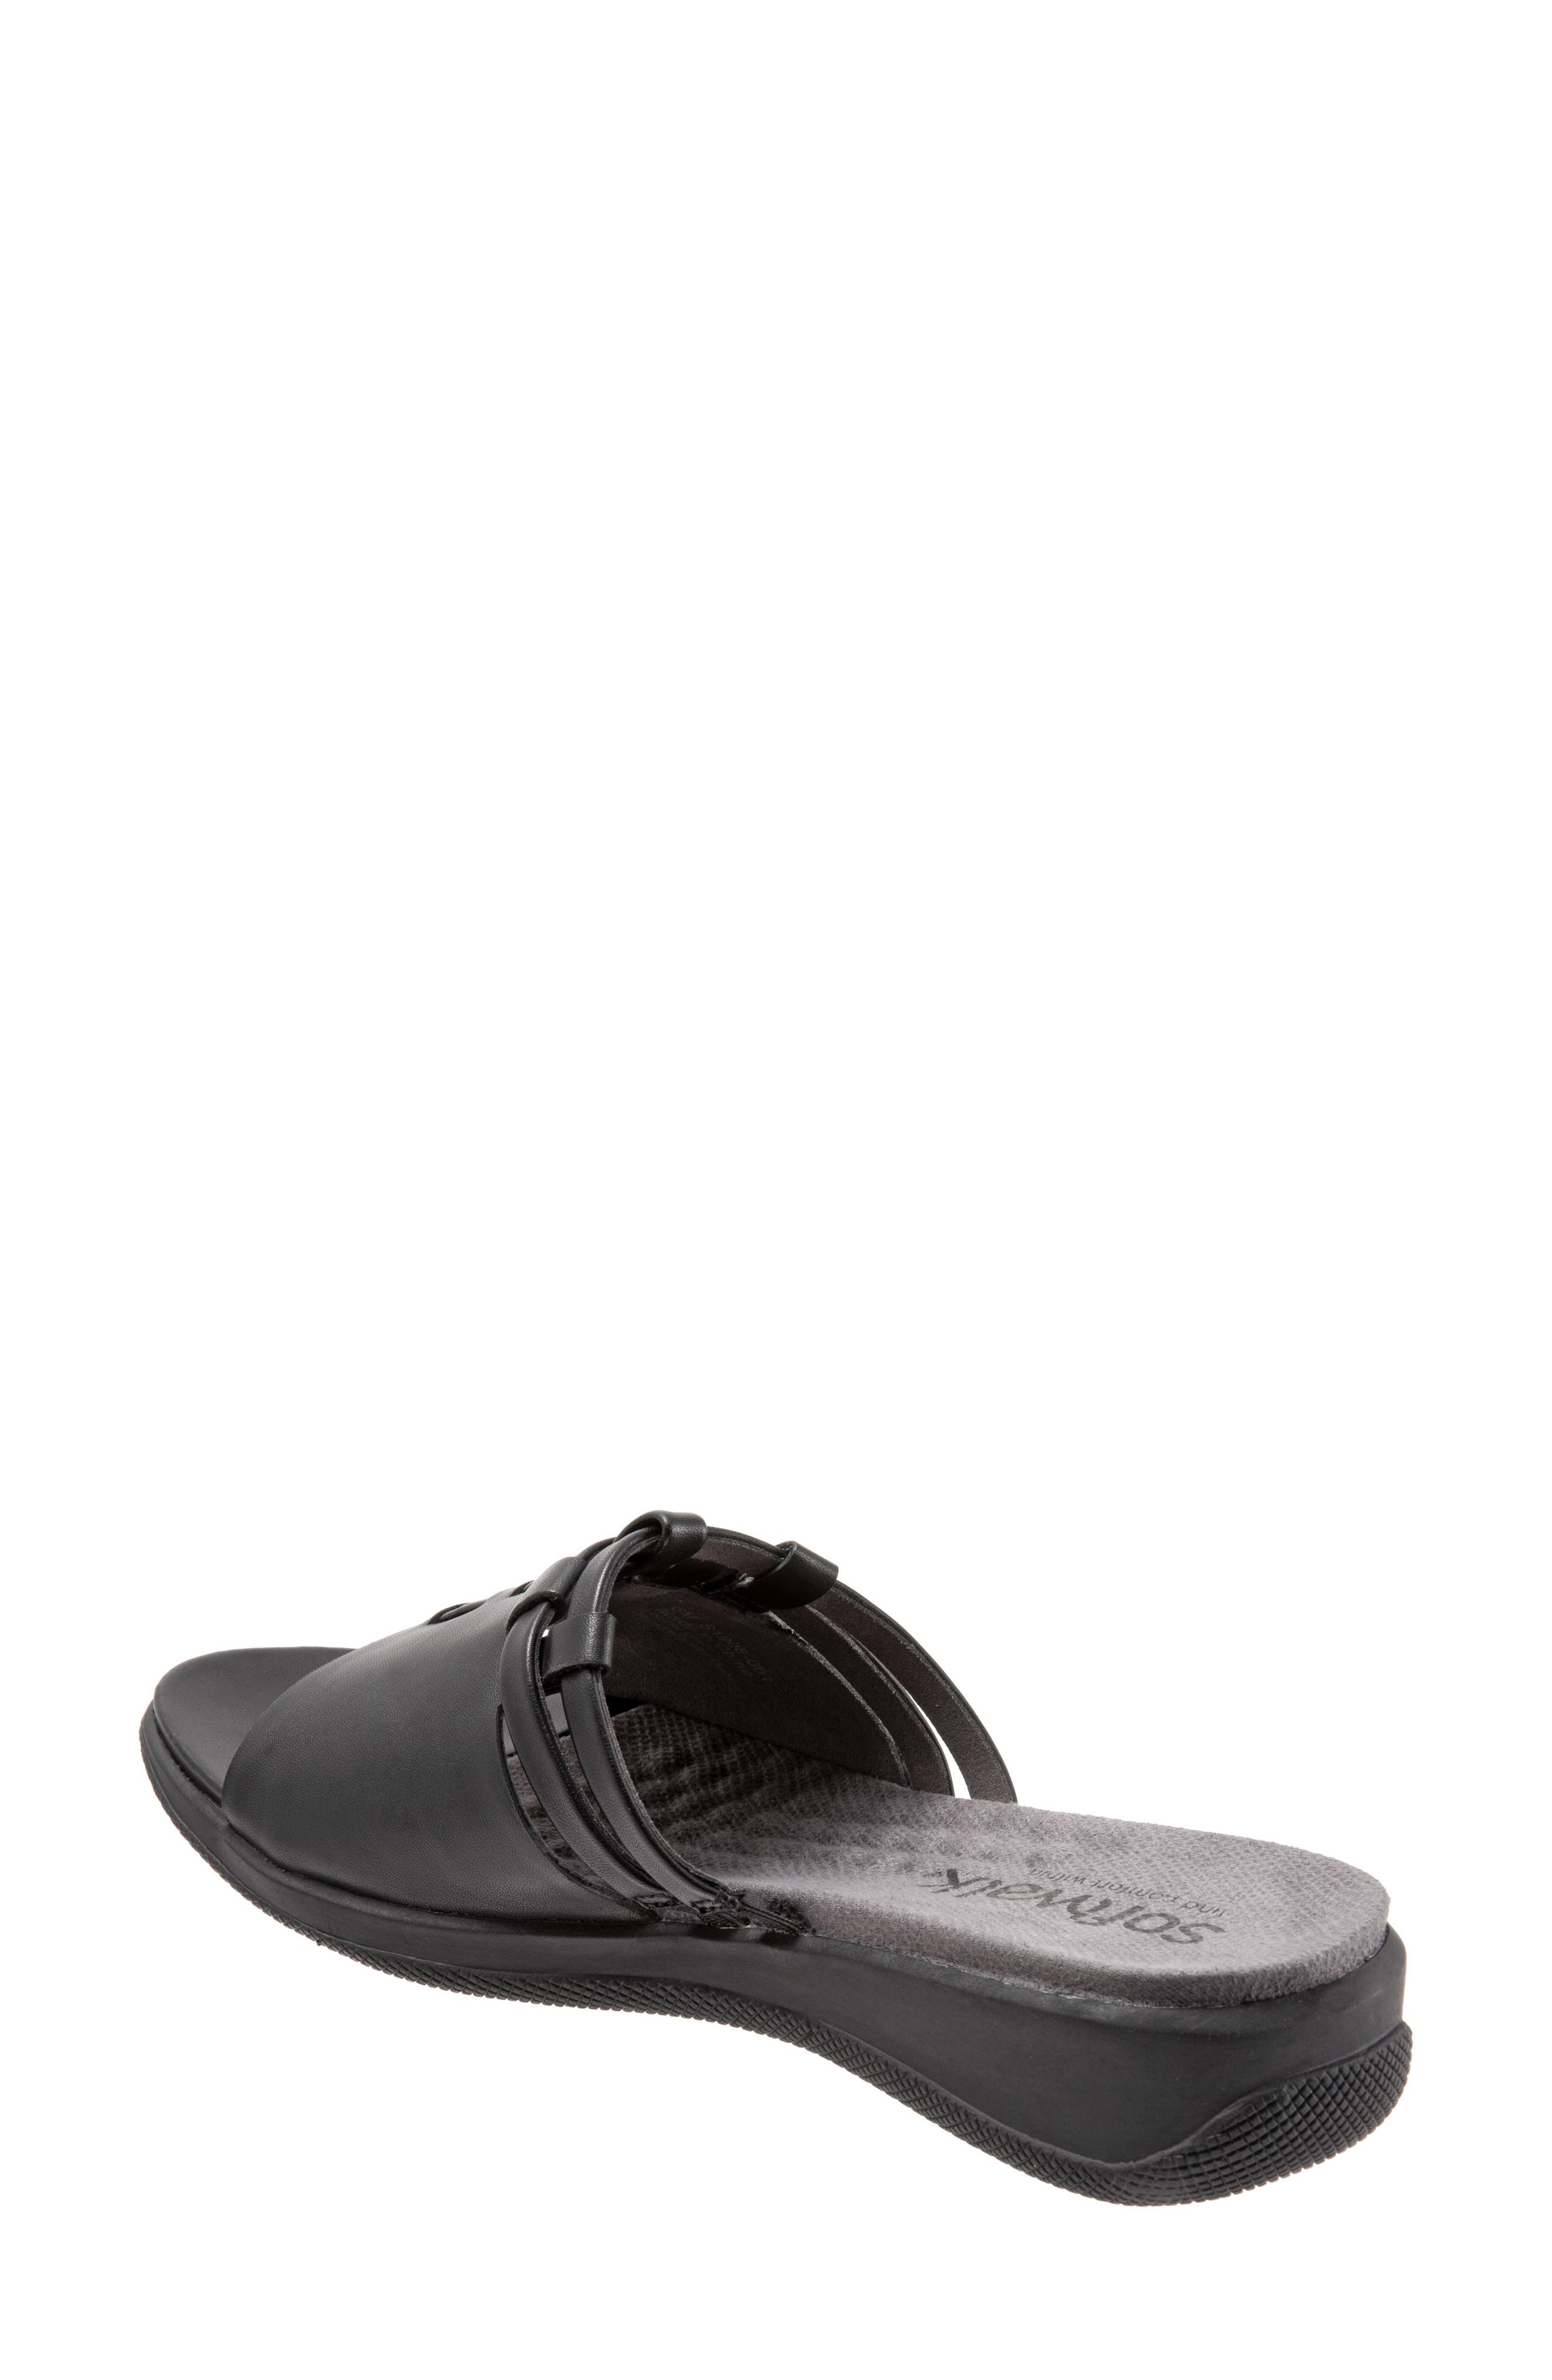 SOFTWALK<SUP>®</SUP>, Tahoma Woven Slide Sandal, Alternate thumbnail 2, color, BLACK LEATHER